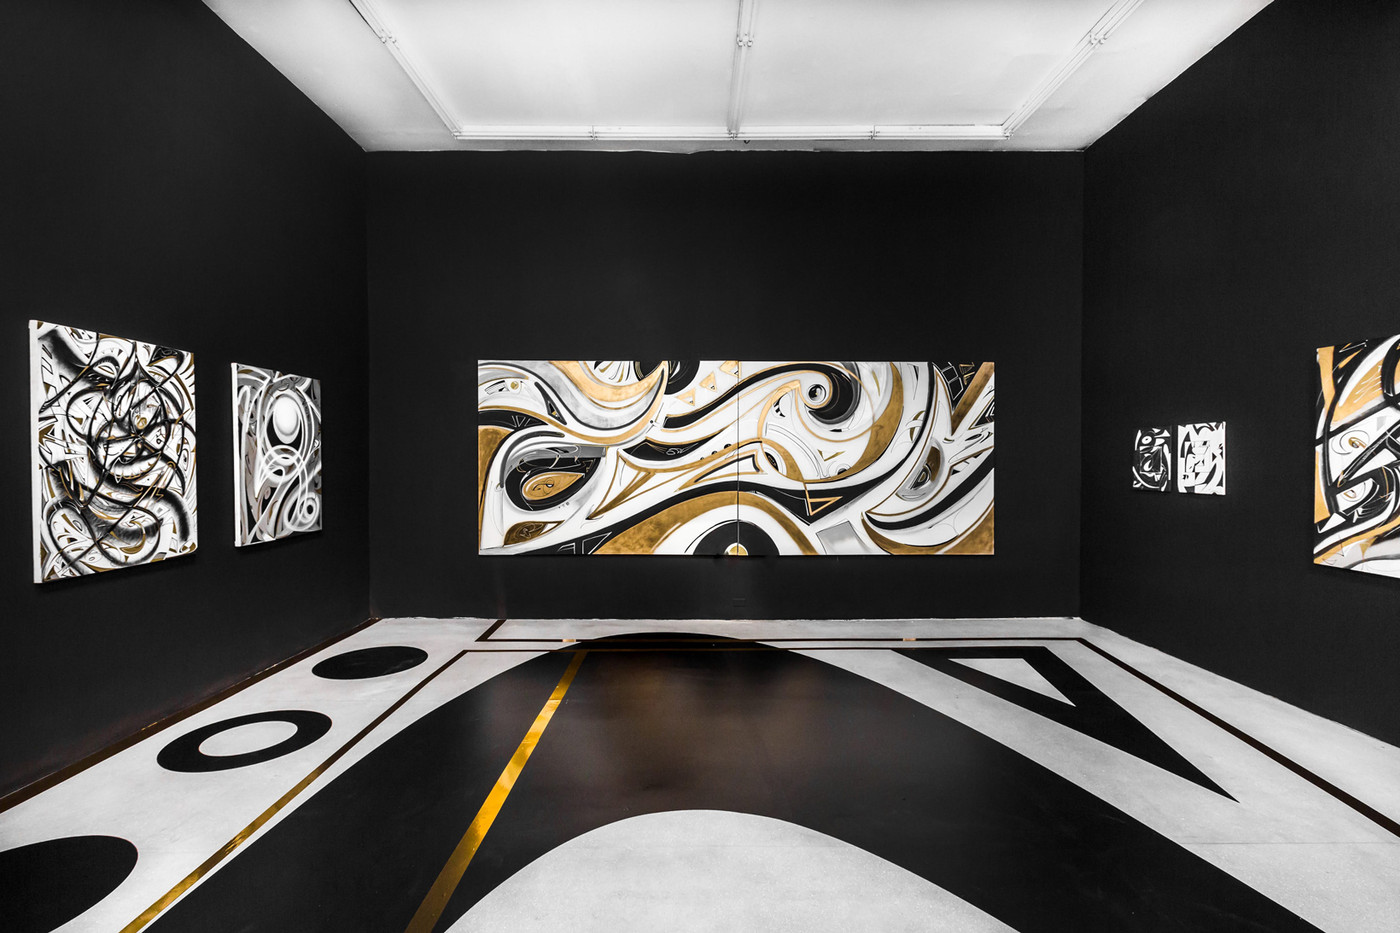 https---hypebeast.com-image-2018-06-zeehan-wazed-abxy-gallery-momentum-exhibition-1.jpg